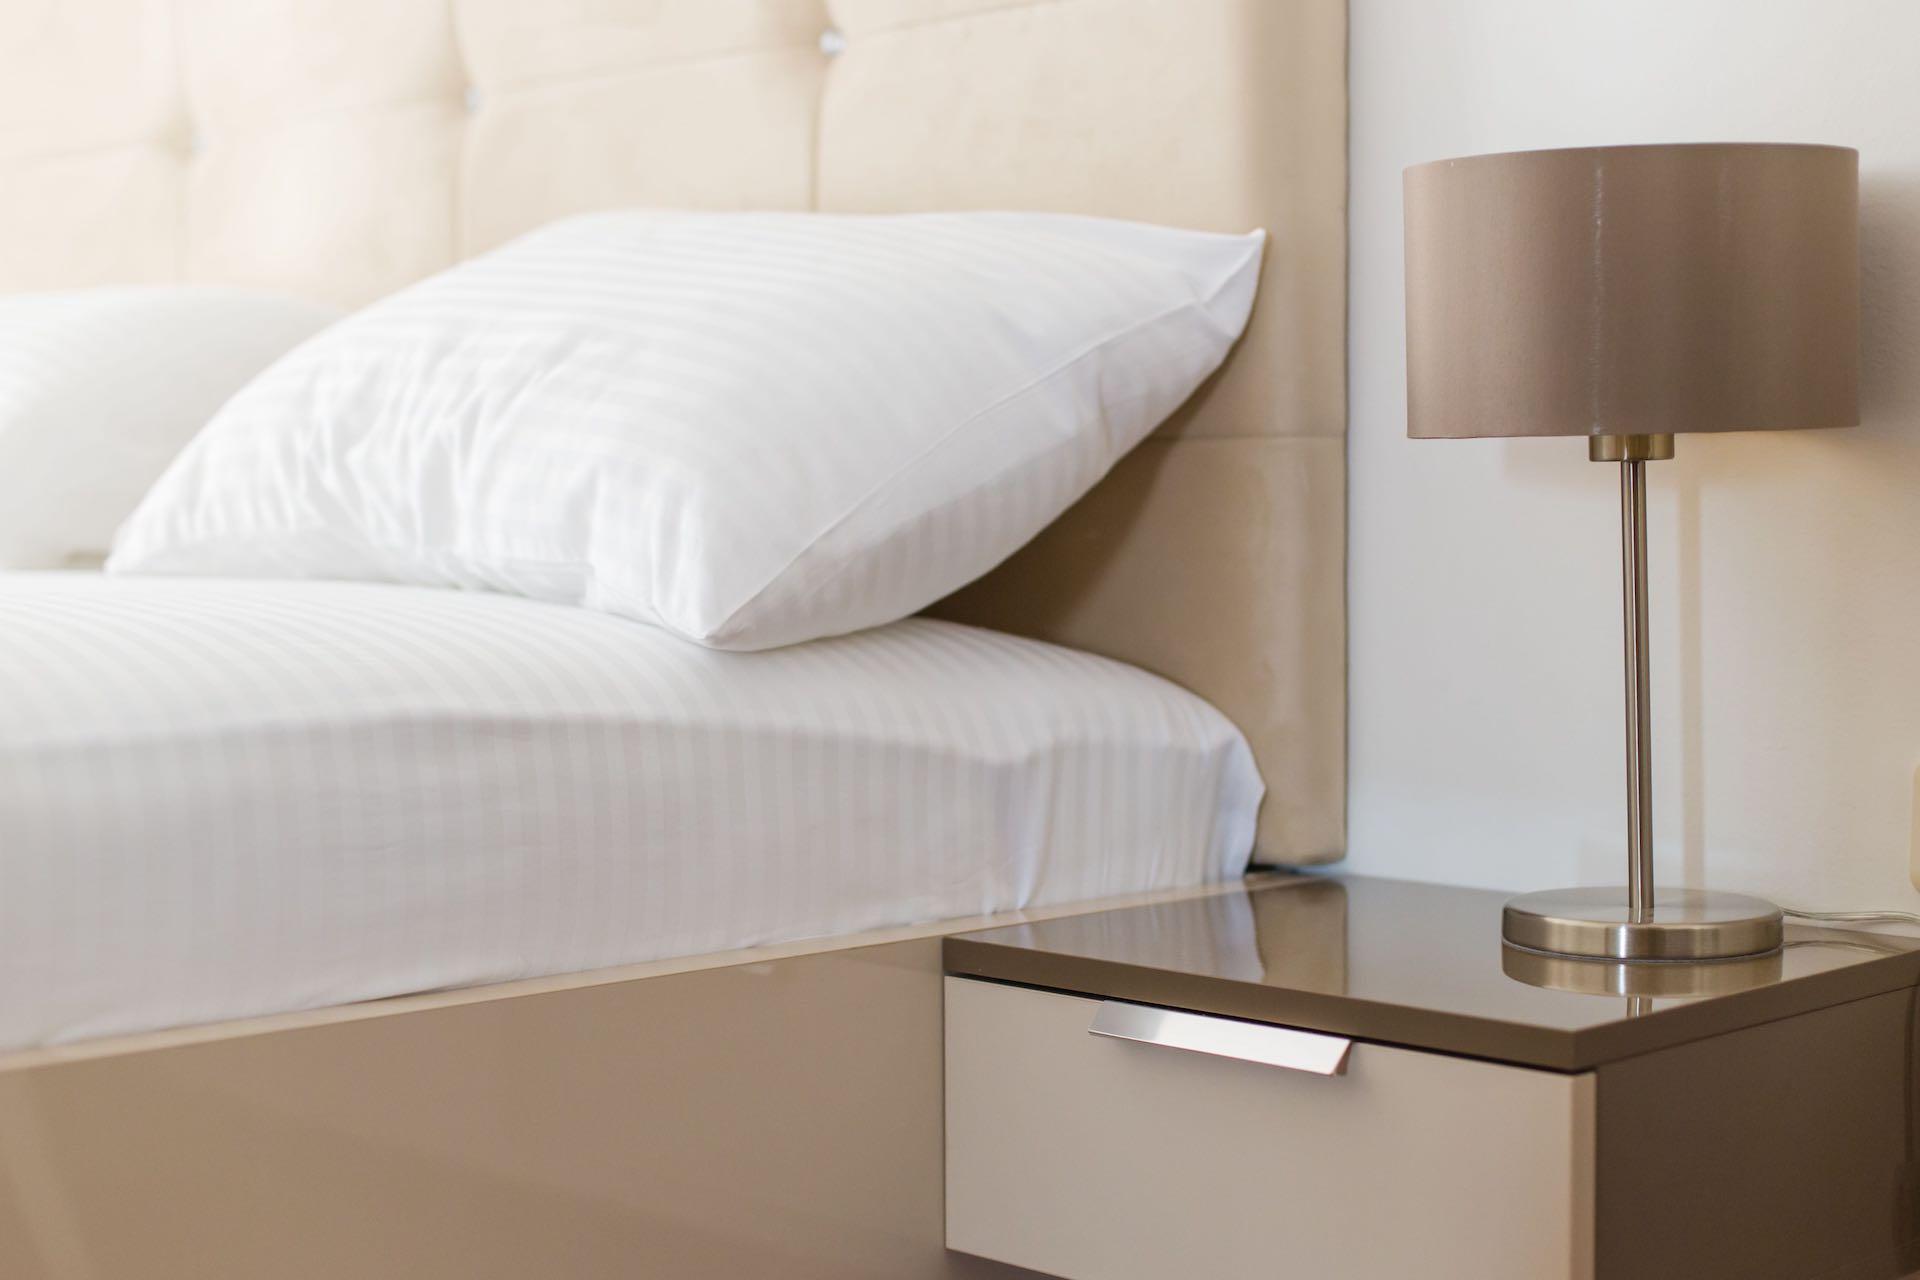 Two Bedroom Apartments Aparthotel Anatolia Becici Budva Montenegro Best Hotel Book Now 52.jpg